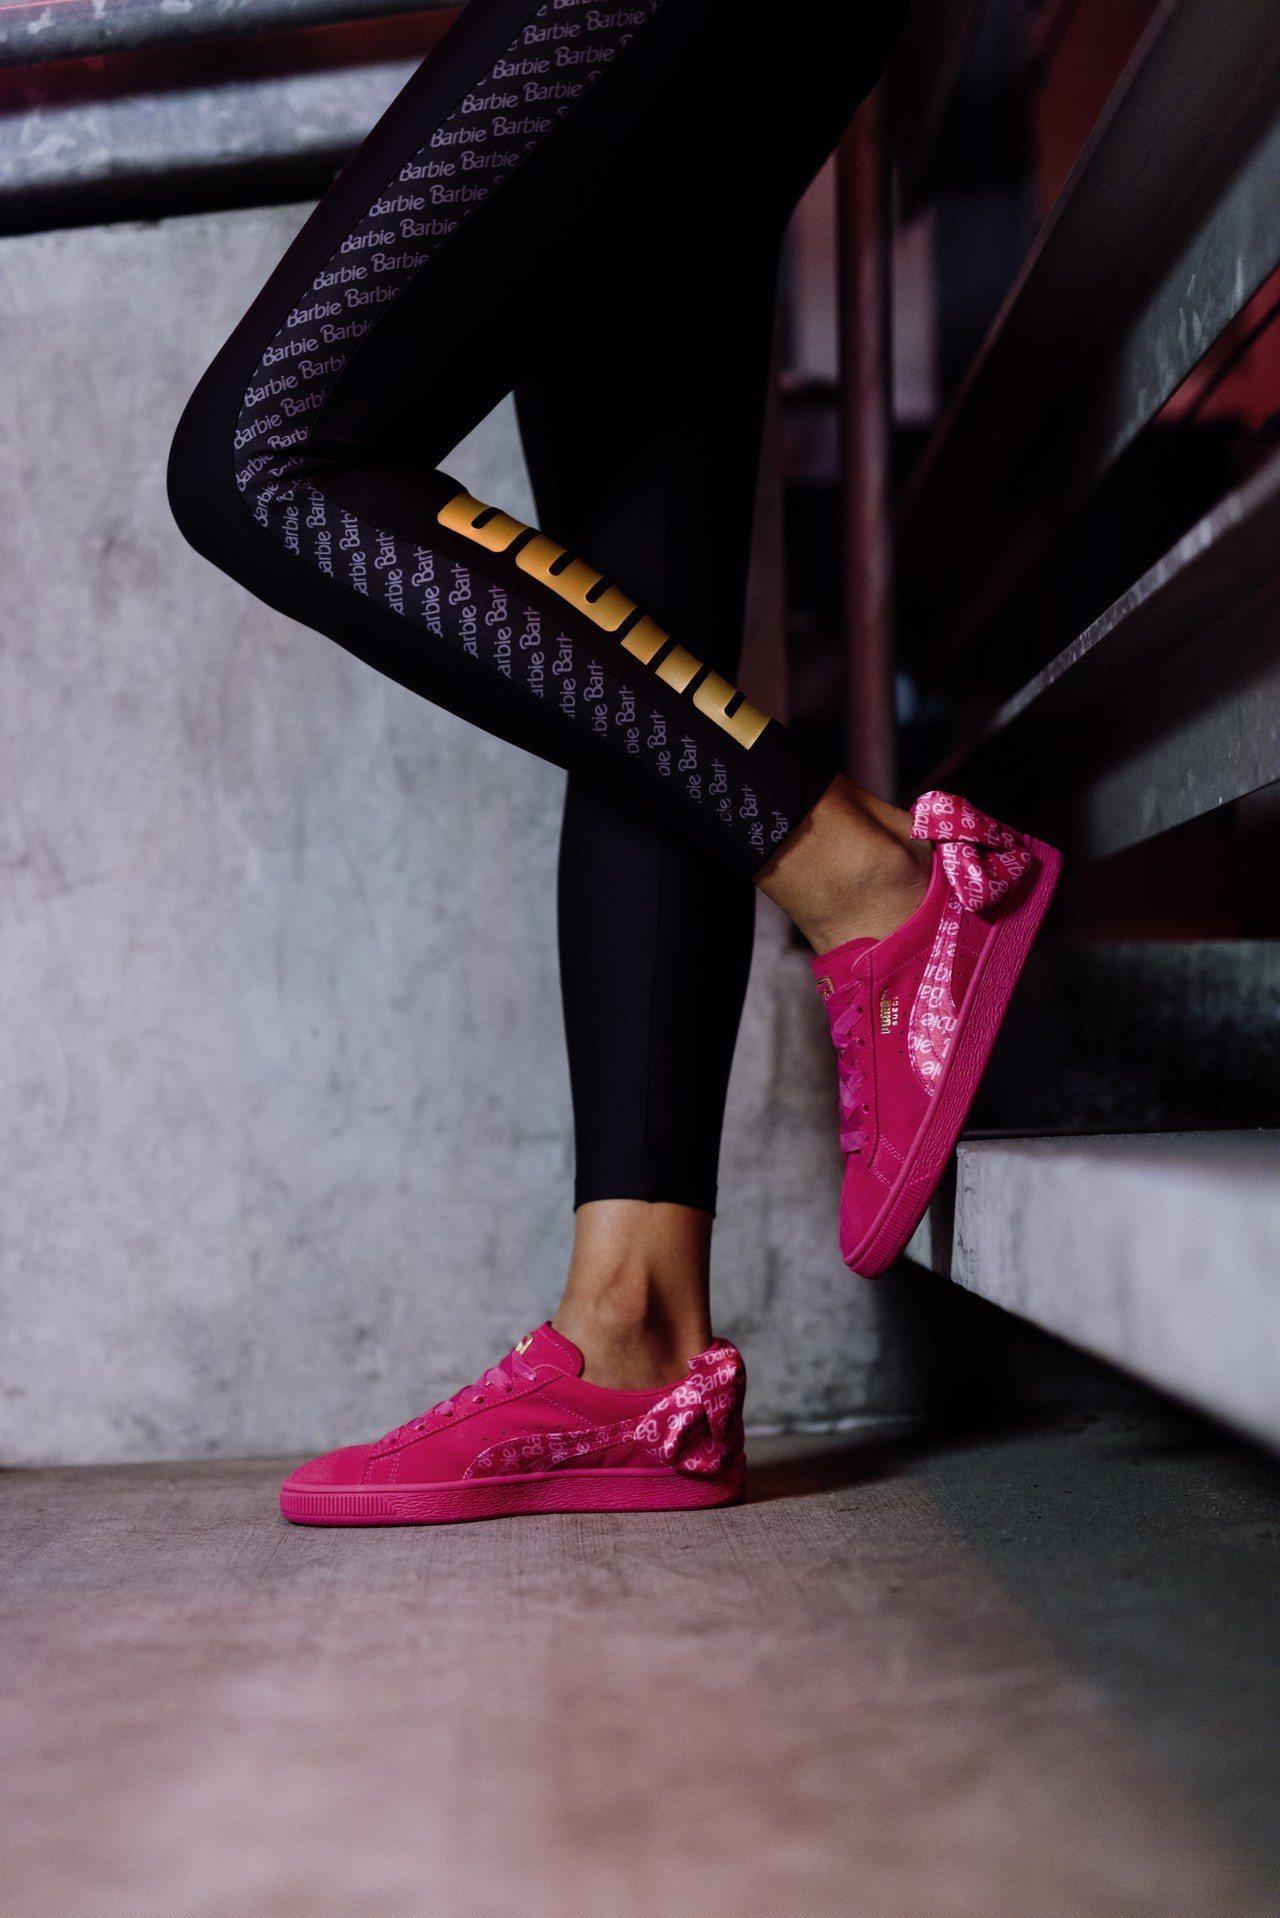 Puma打造全台超限量12 組夢幻芭比精裝禮盒組,包括限定版覆盆莓粉Suede鞋...